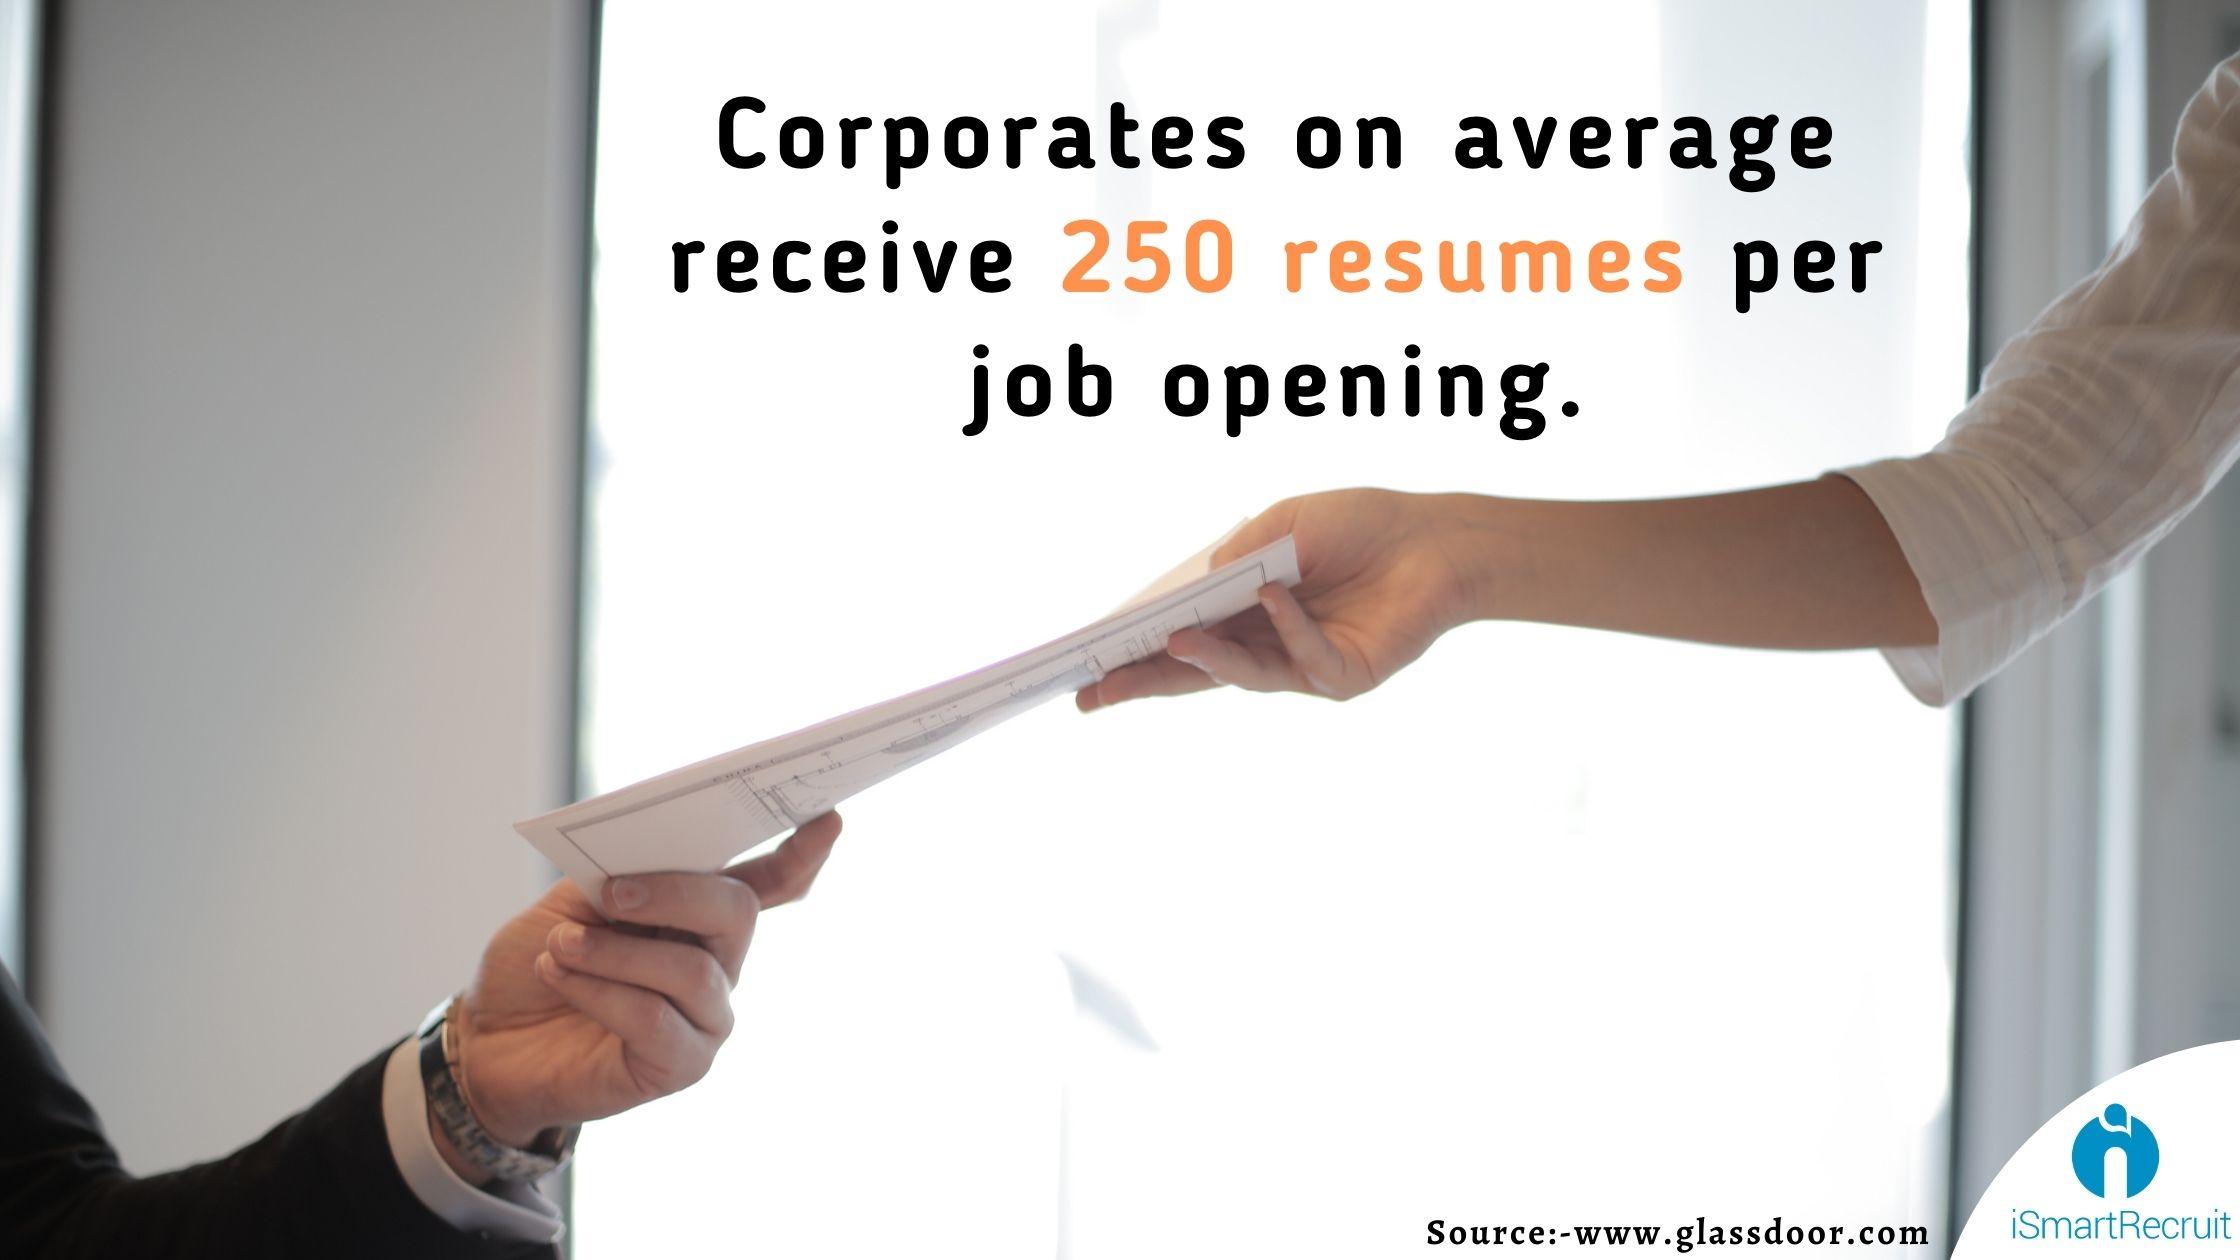 Corporates on average receive 250 resumes per job opening